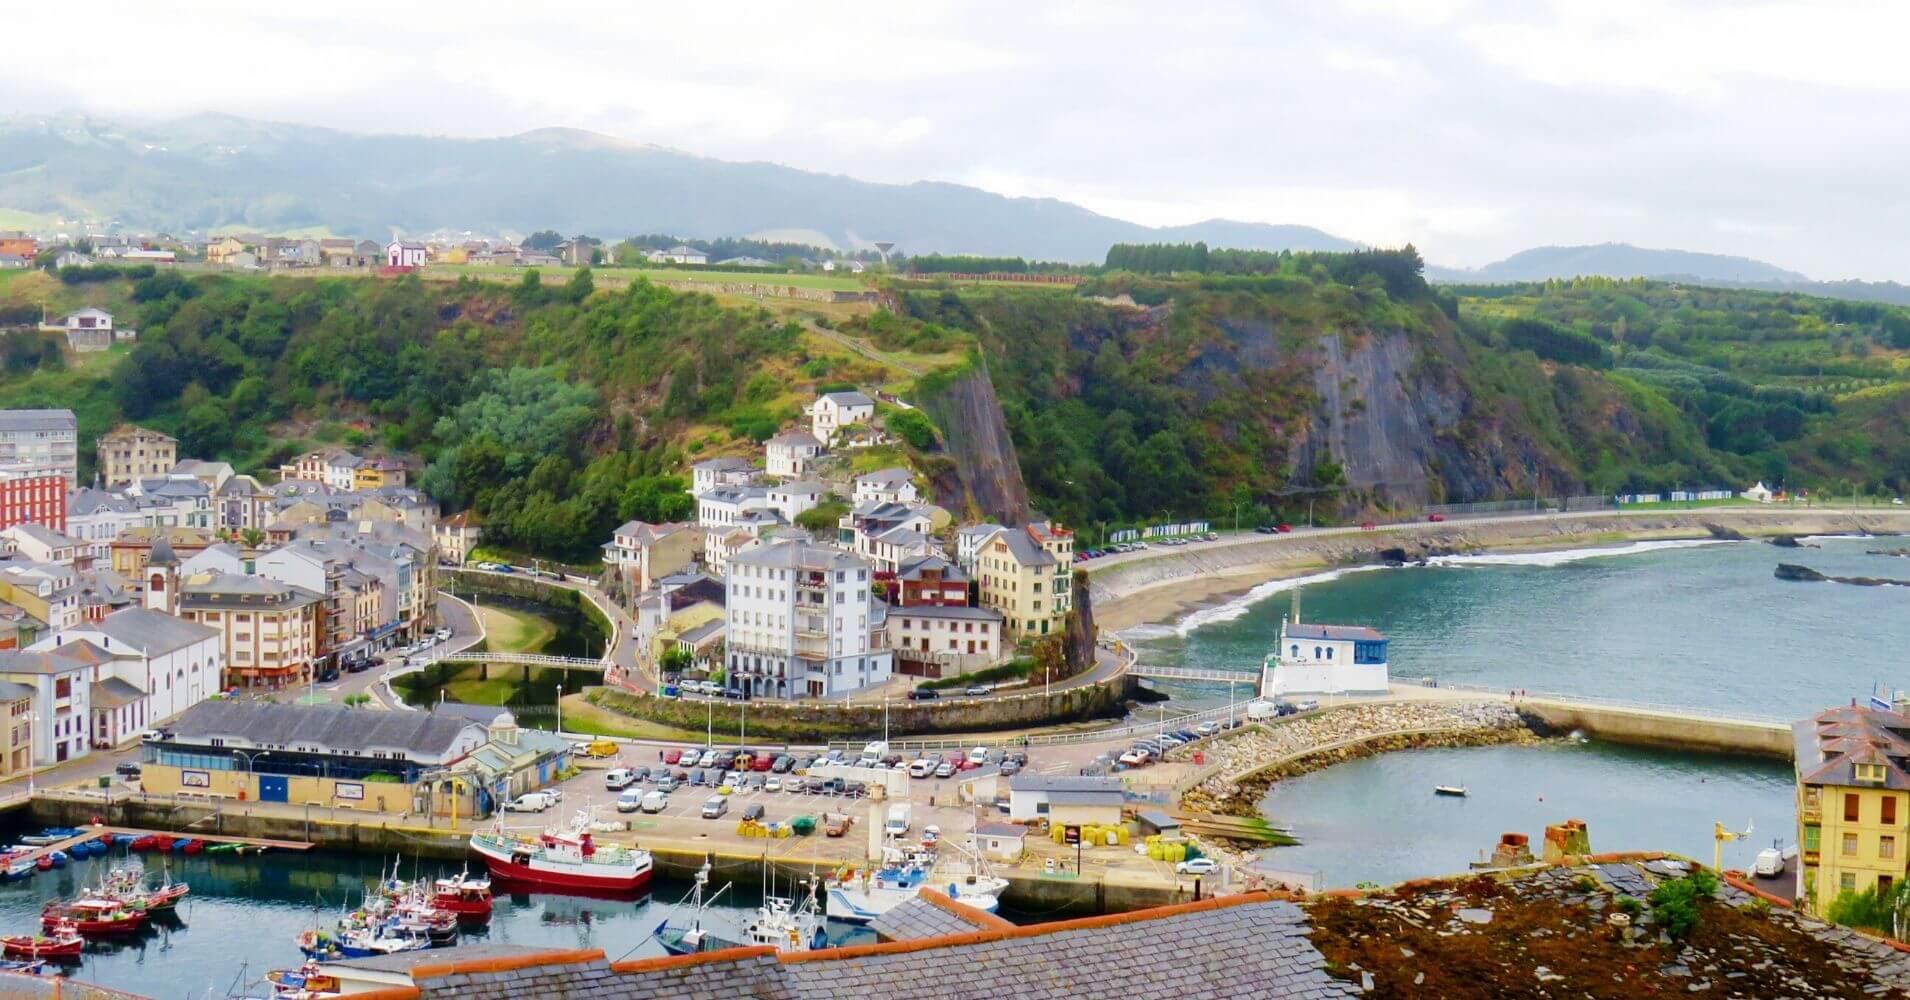 Luarca, Asturias Maravilla Natural.